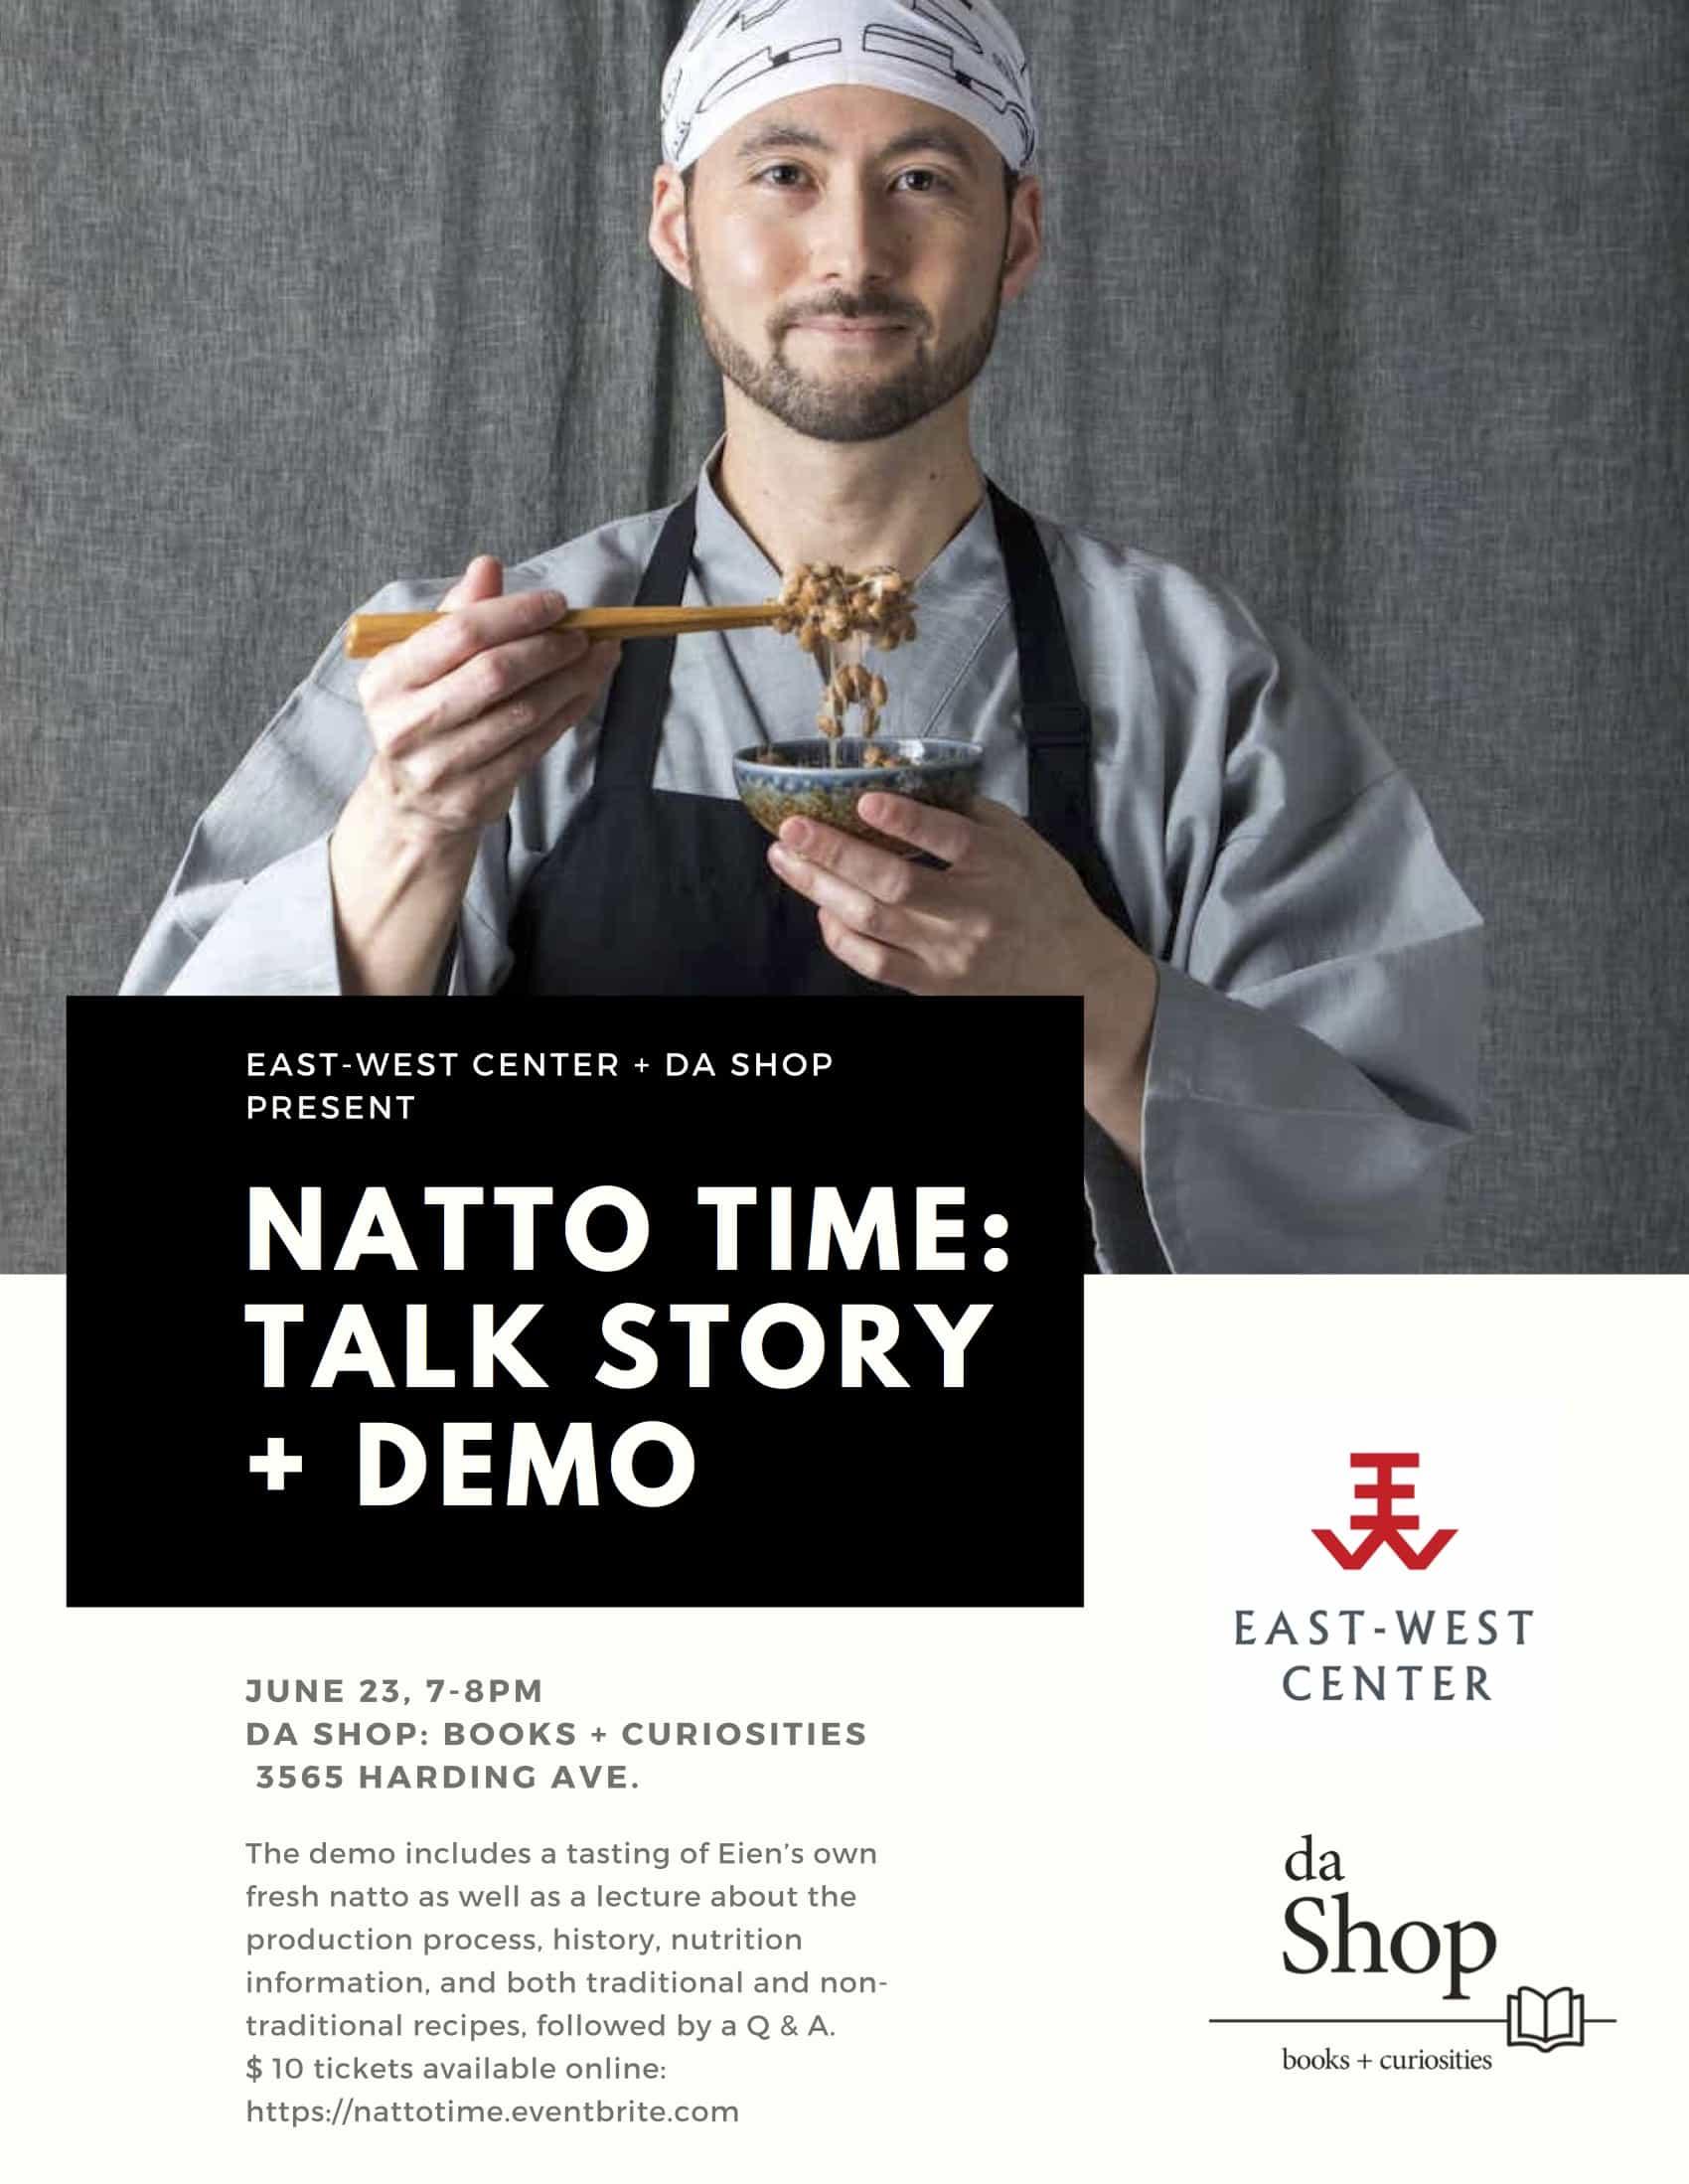 natto time at da Shop flyer - FINAL.jpg